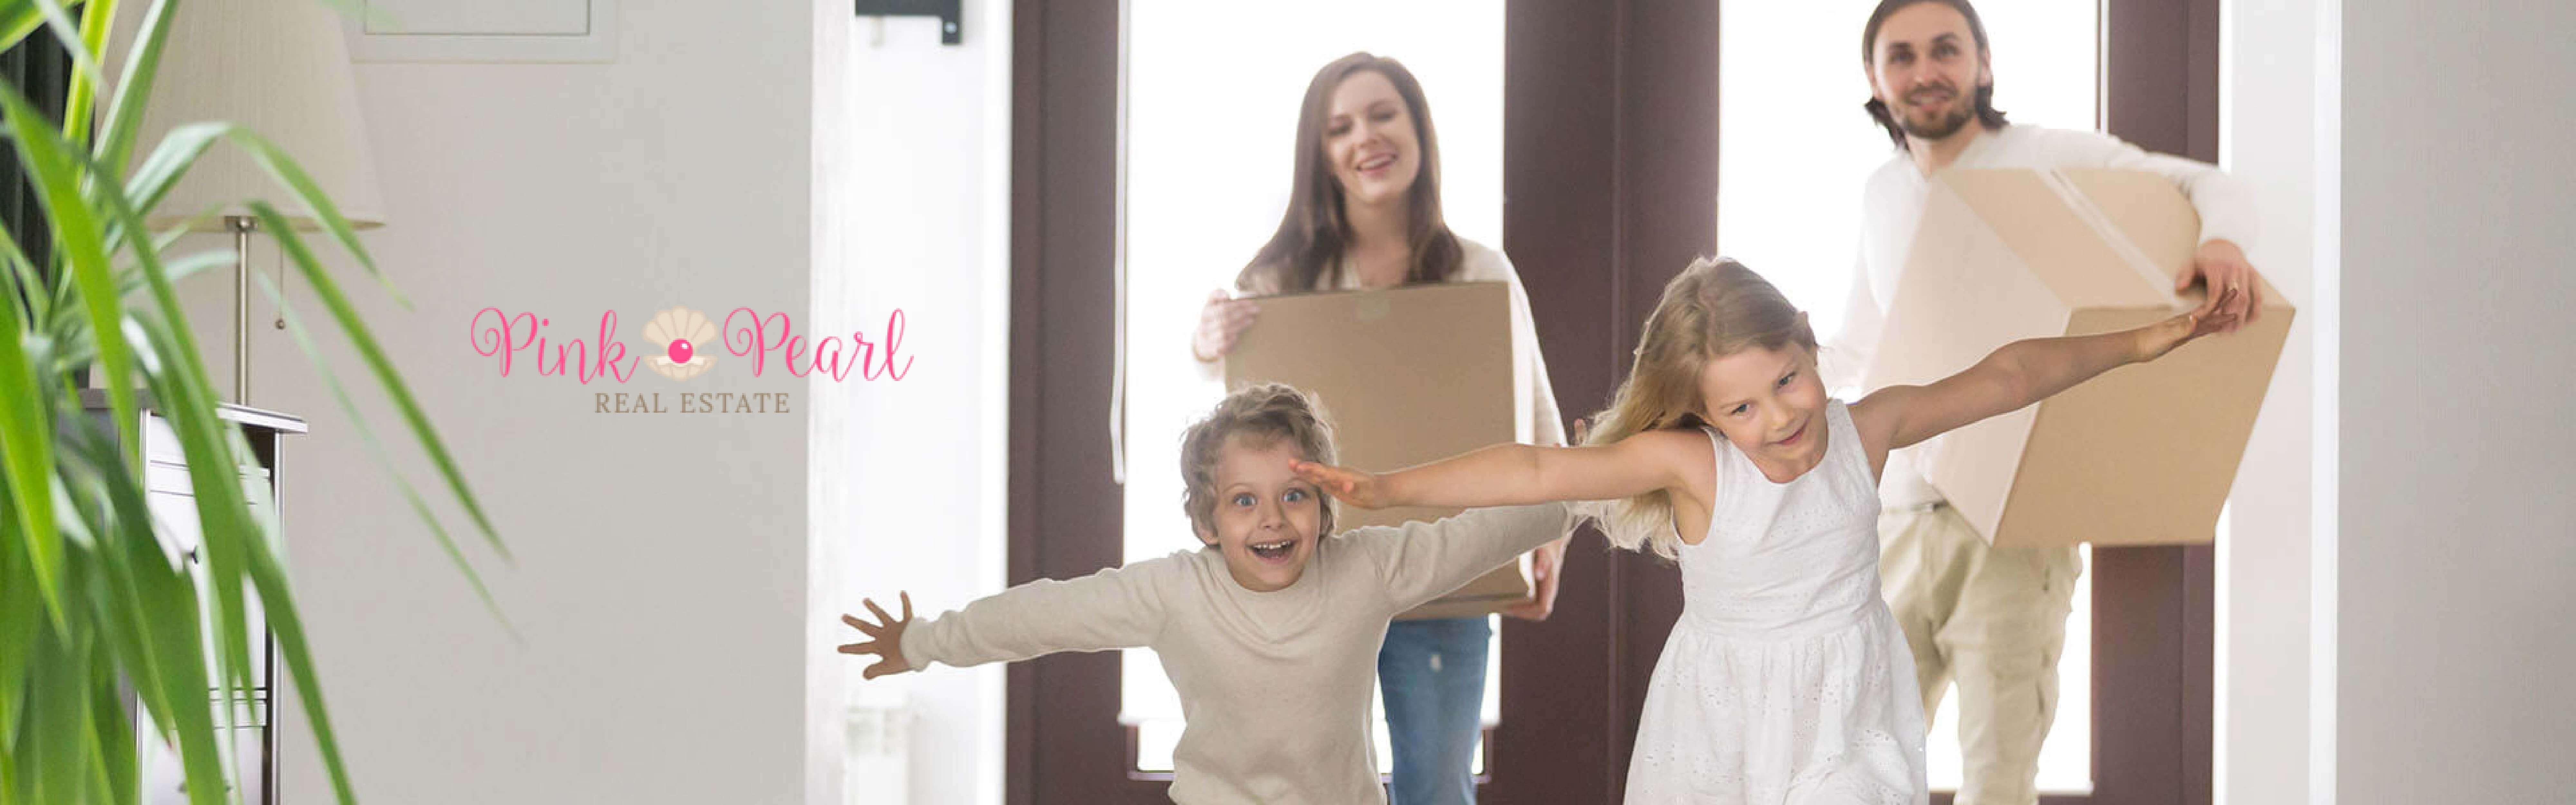 First Time Home Buyers in Virginia Beach Virginia